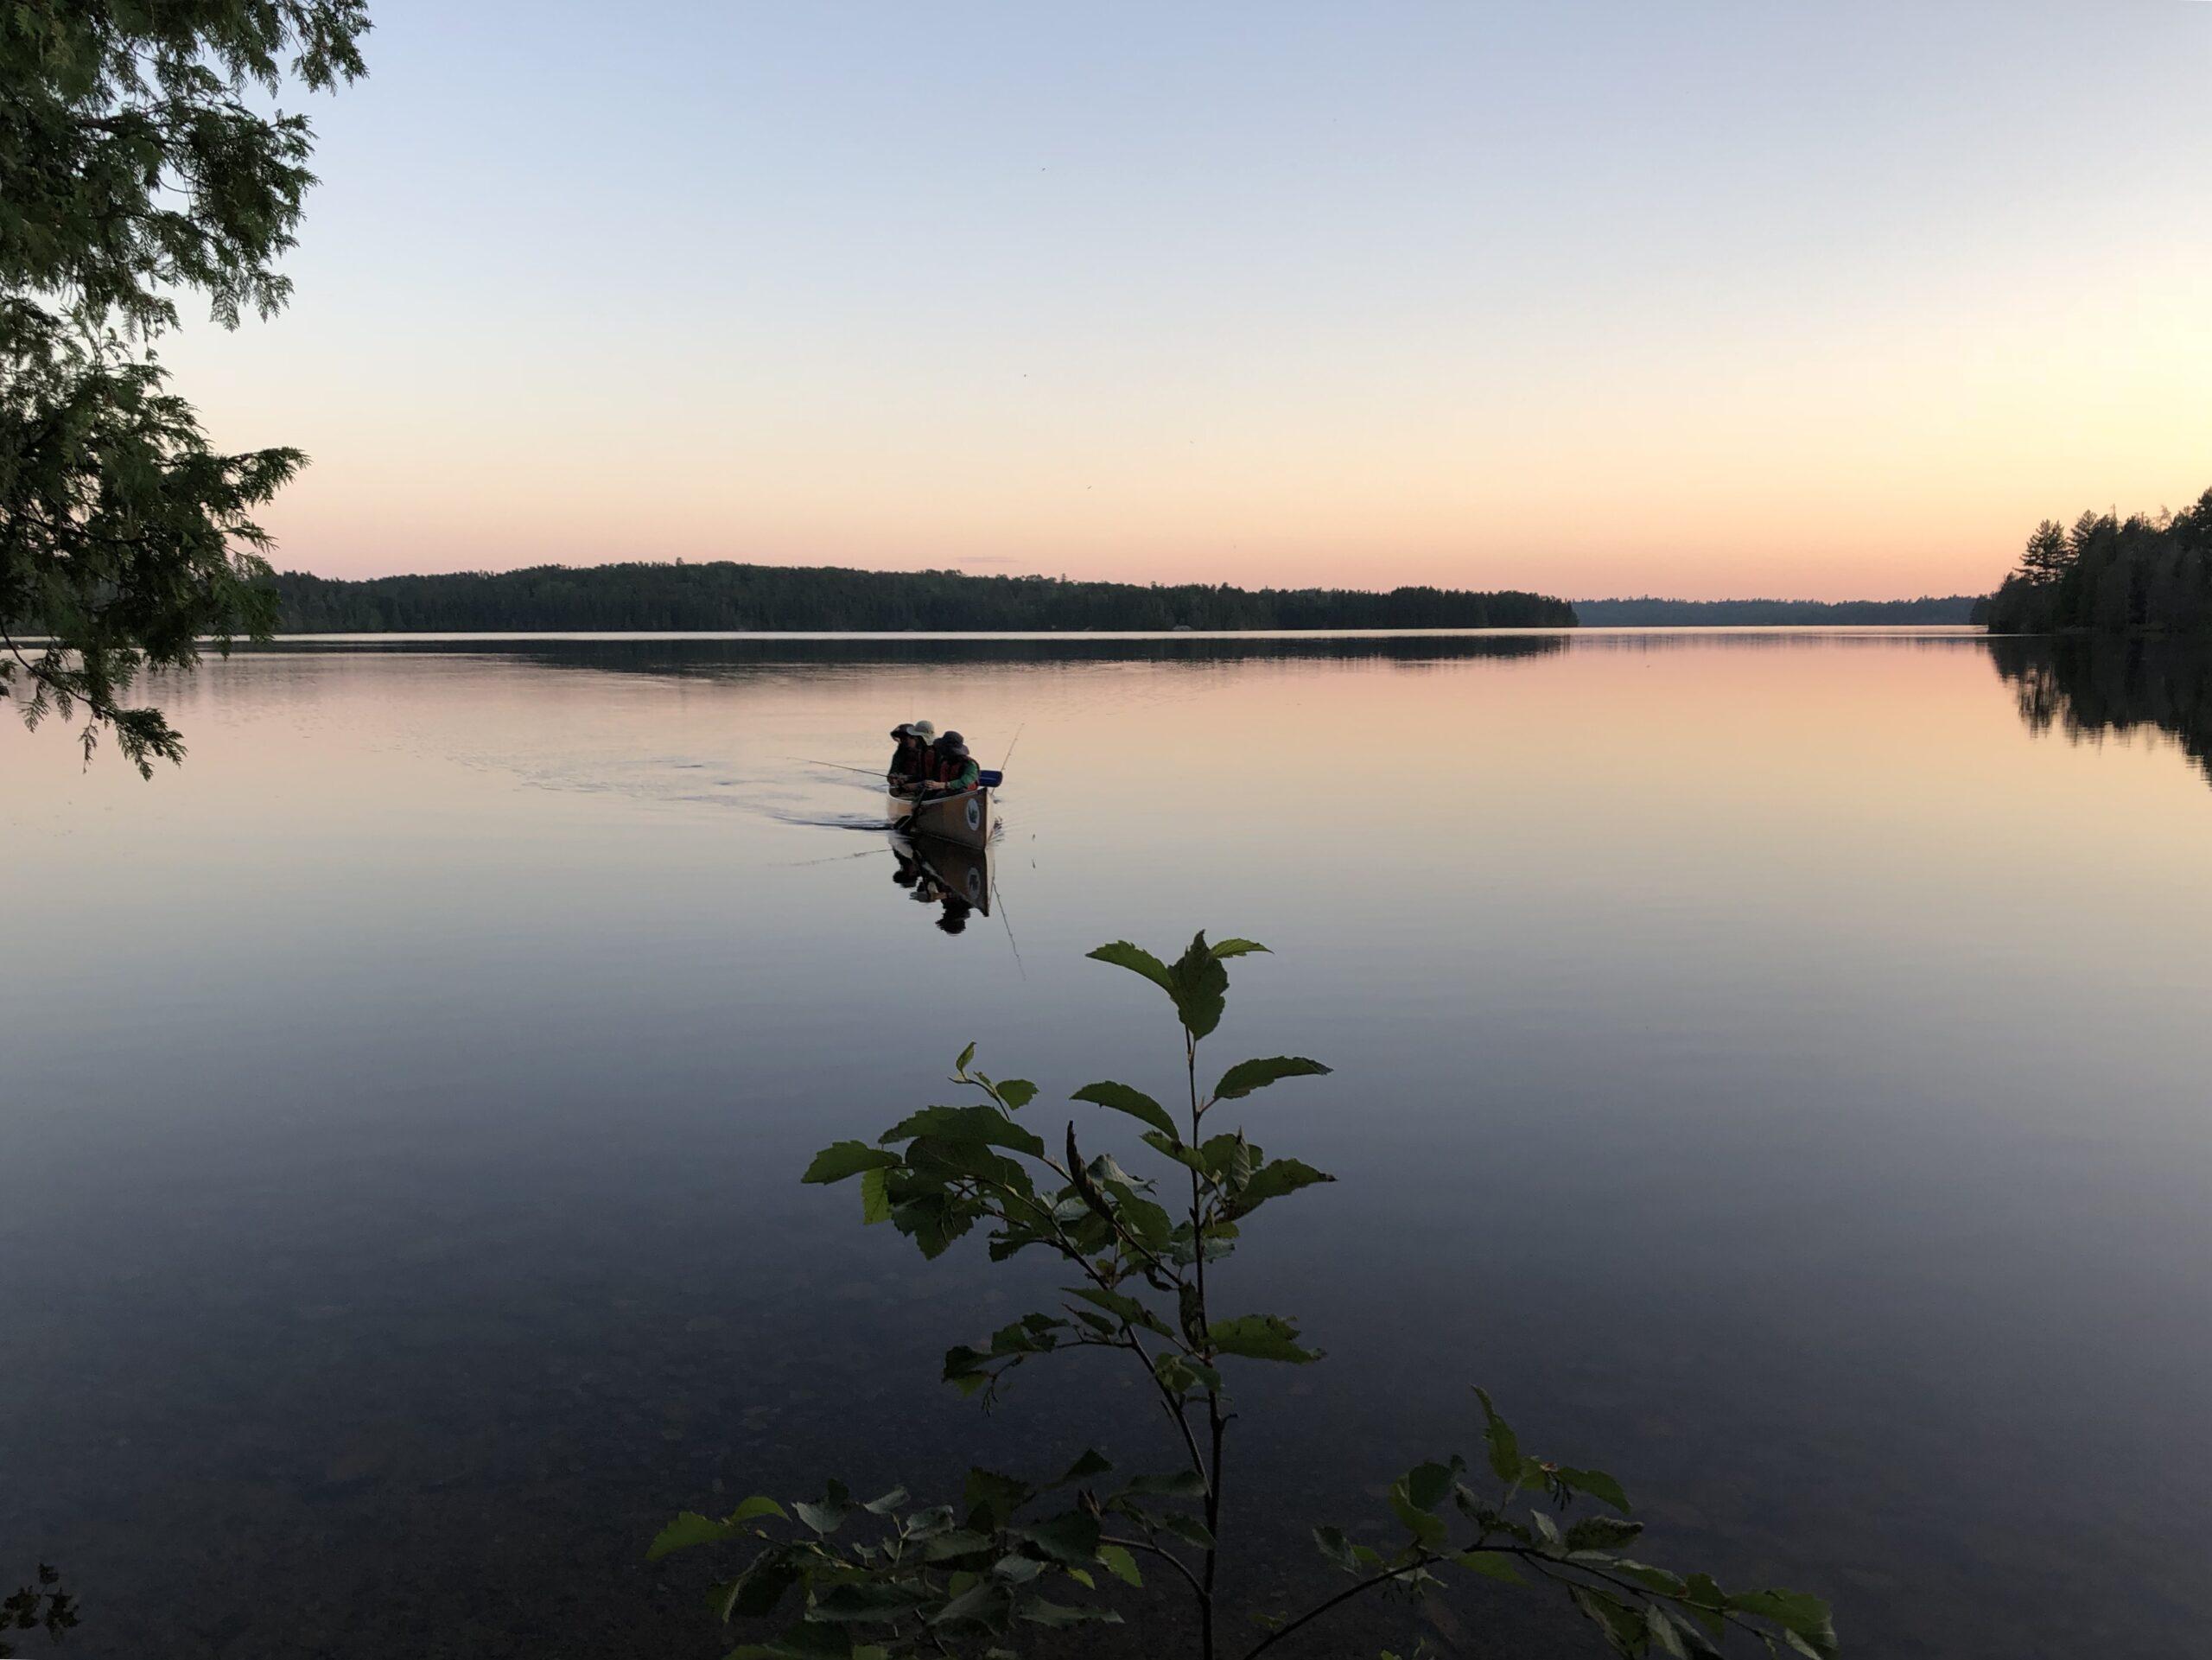 Twilight canoe to fetch water